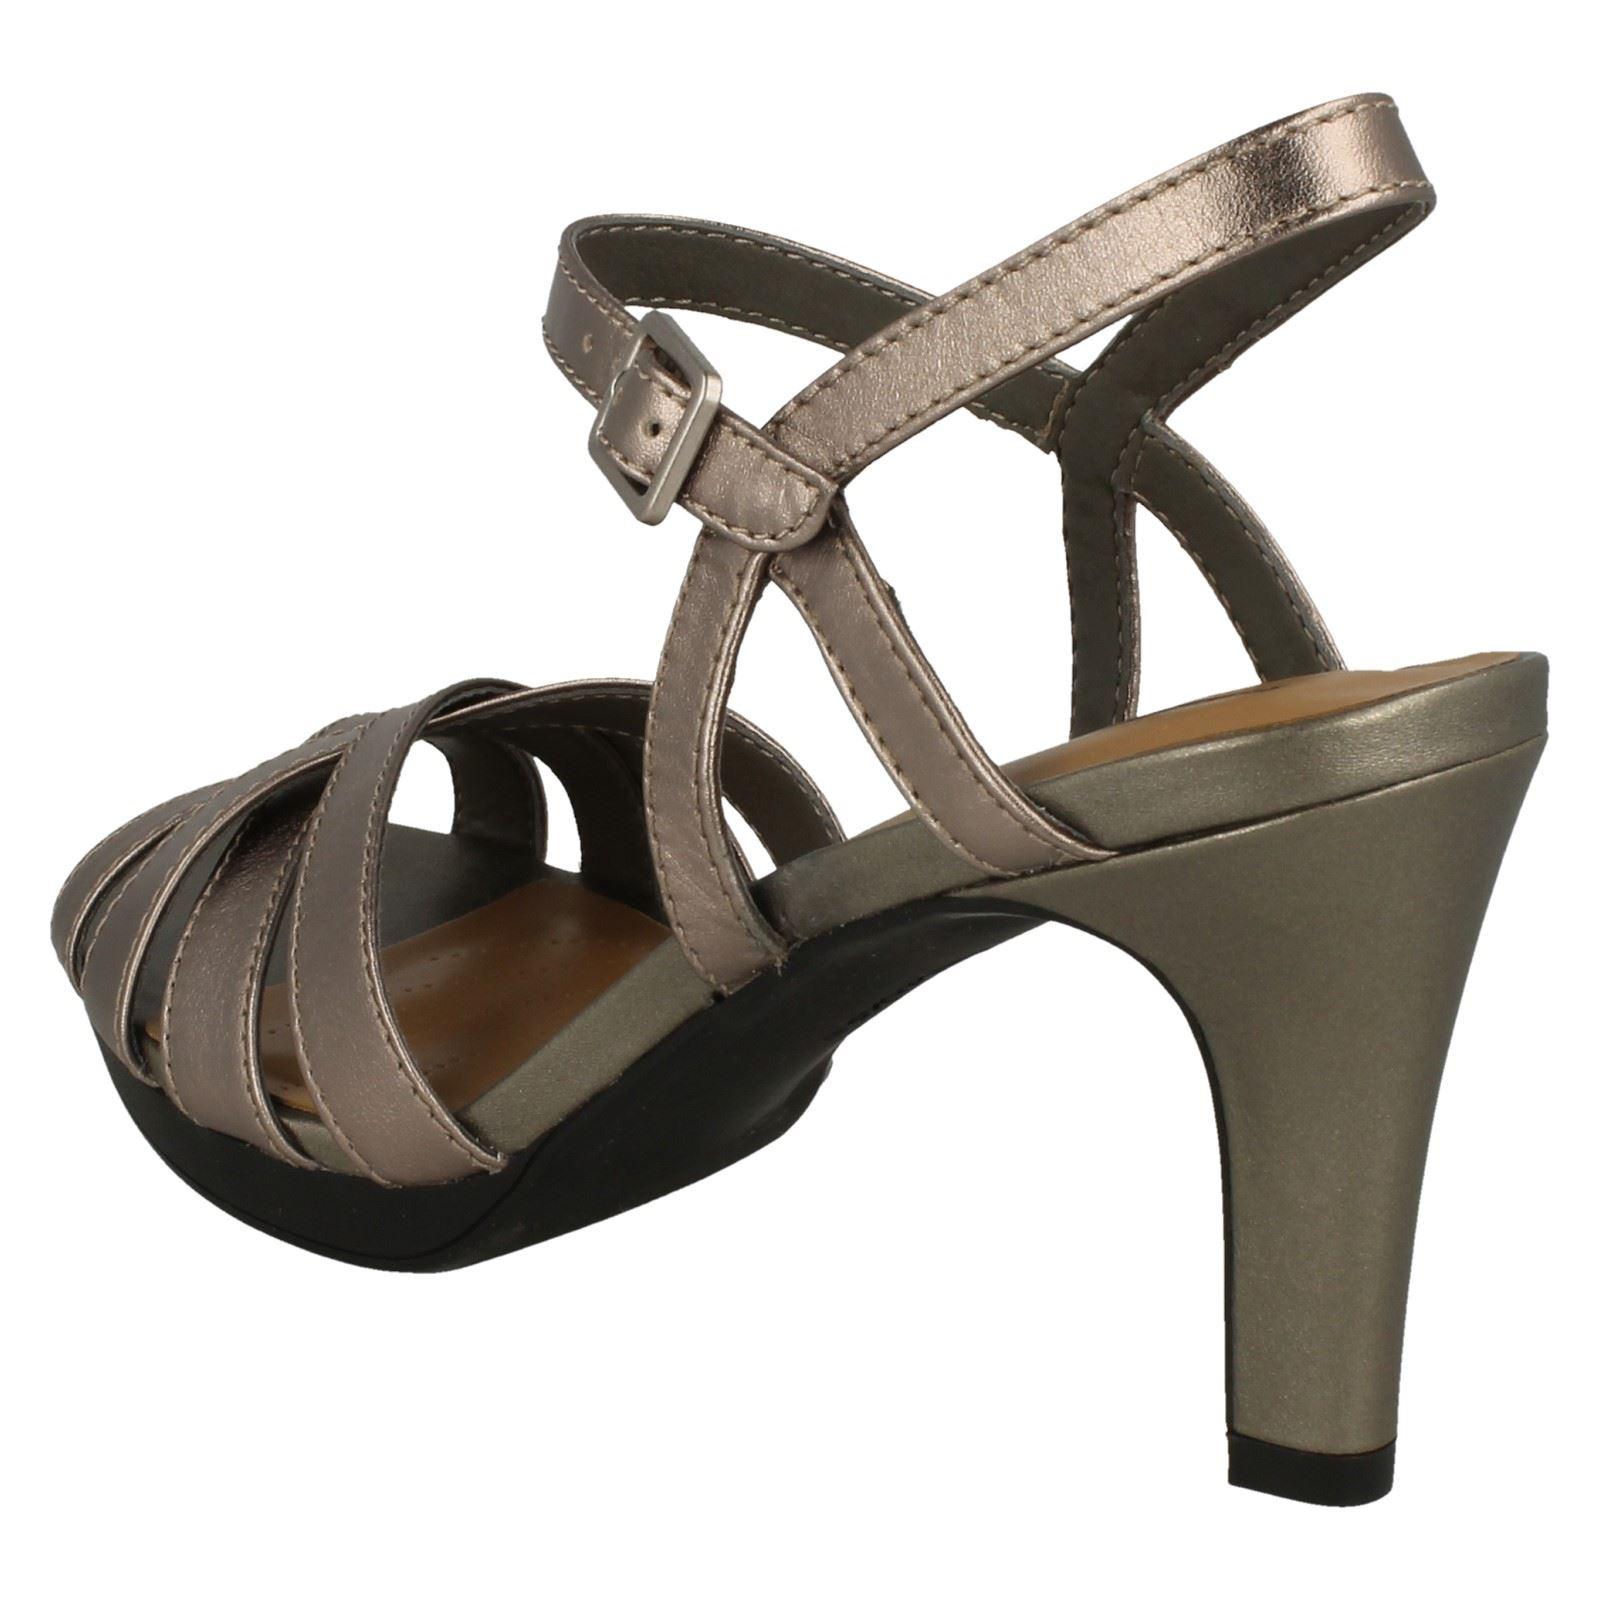 d0ea7083fce Ladies Clarks Slingback High Heel Sandals  Adriel Wavy